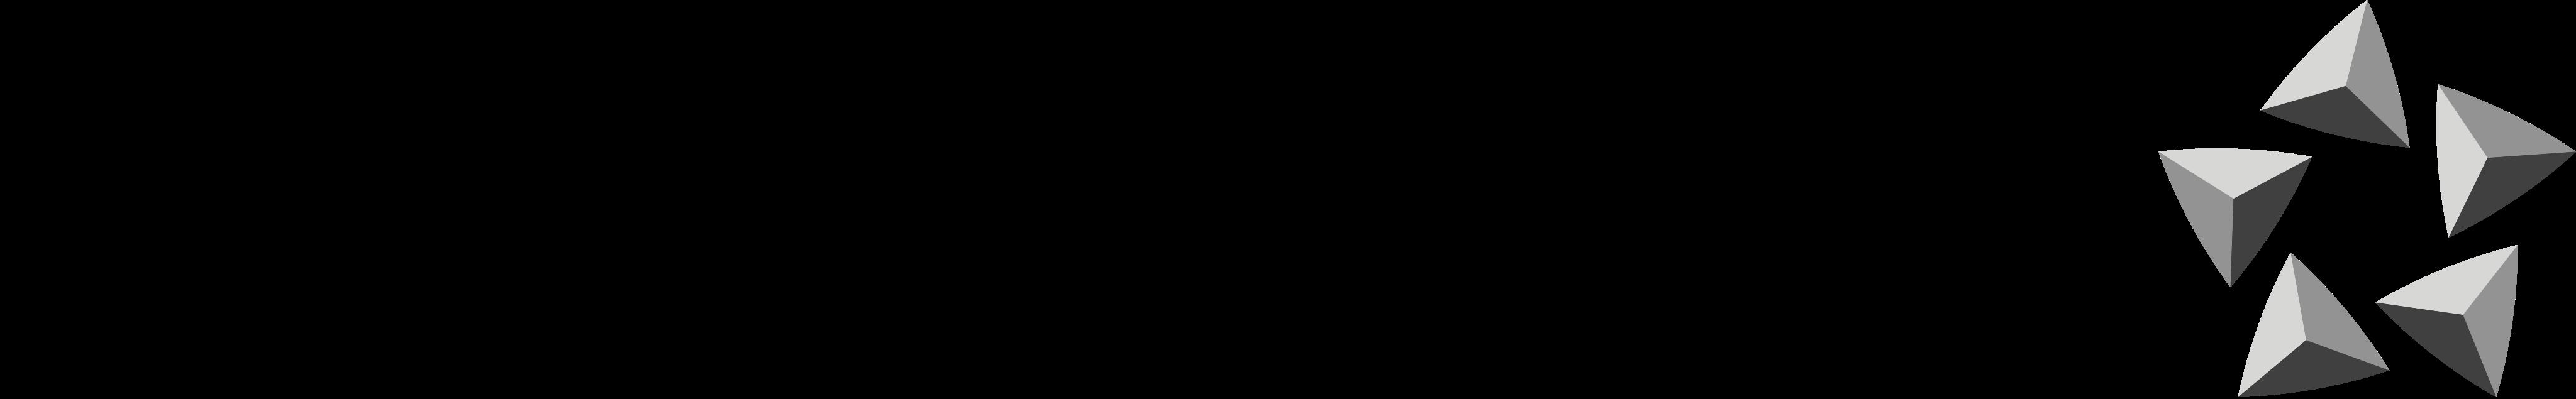 star alliance logo 1 - Star Alliance Logo